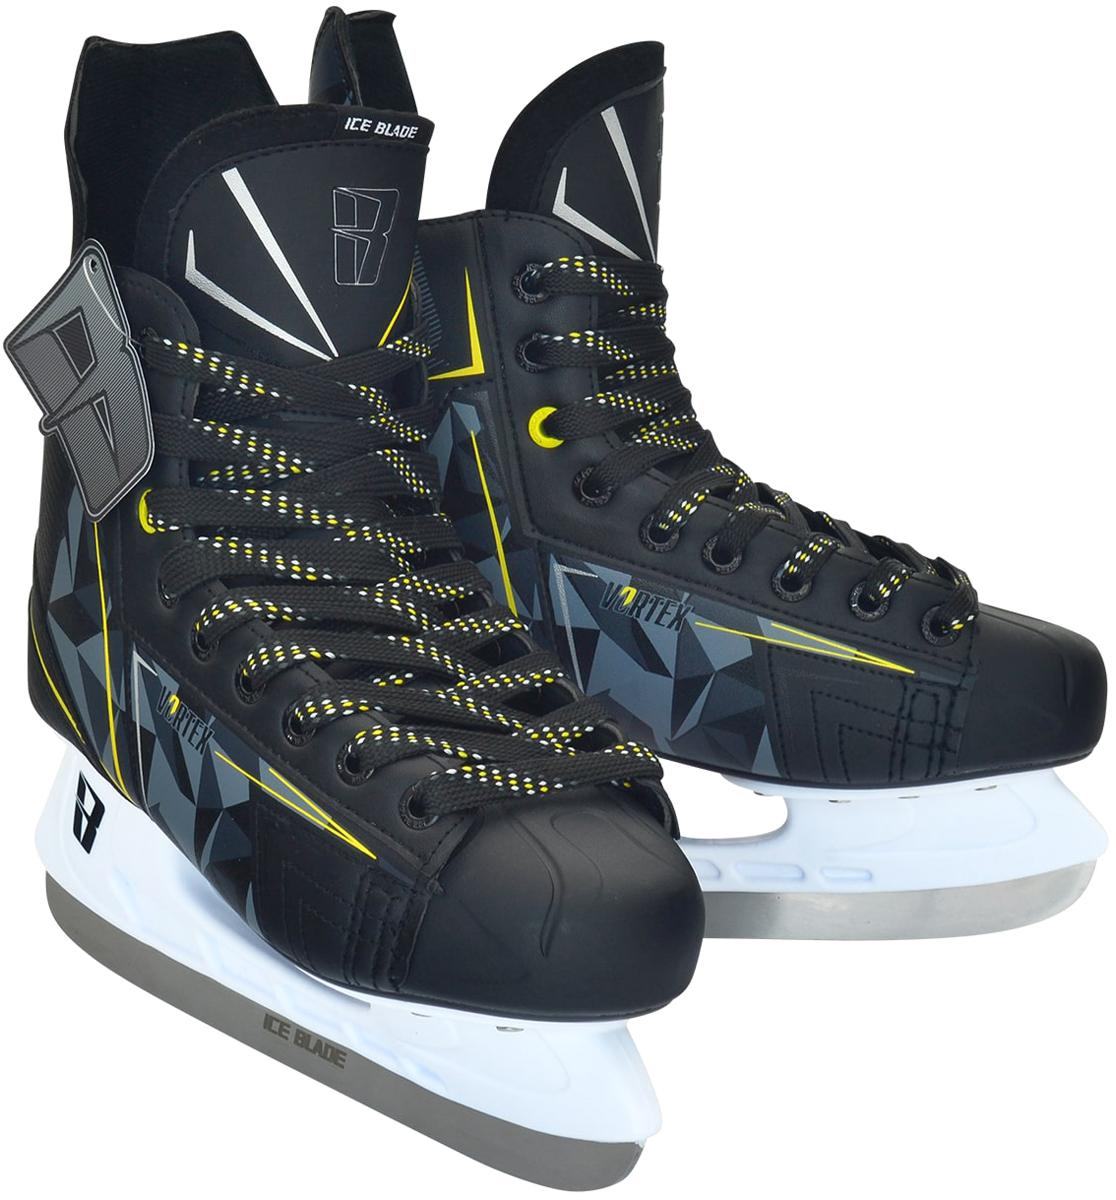 Коньки хоккейные мужские Ice Blade Vortex, цвет: серый, желтый, белый. Размер 46